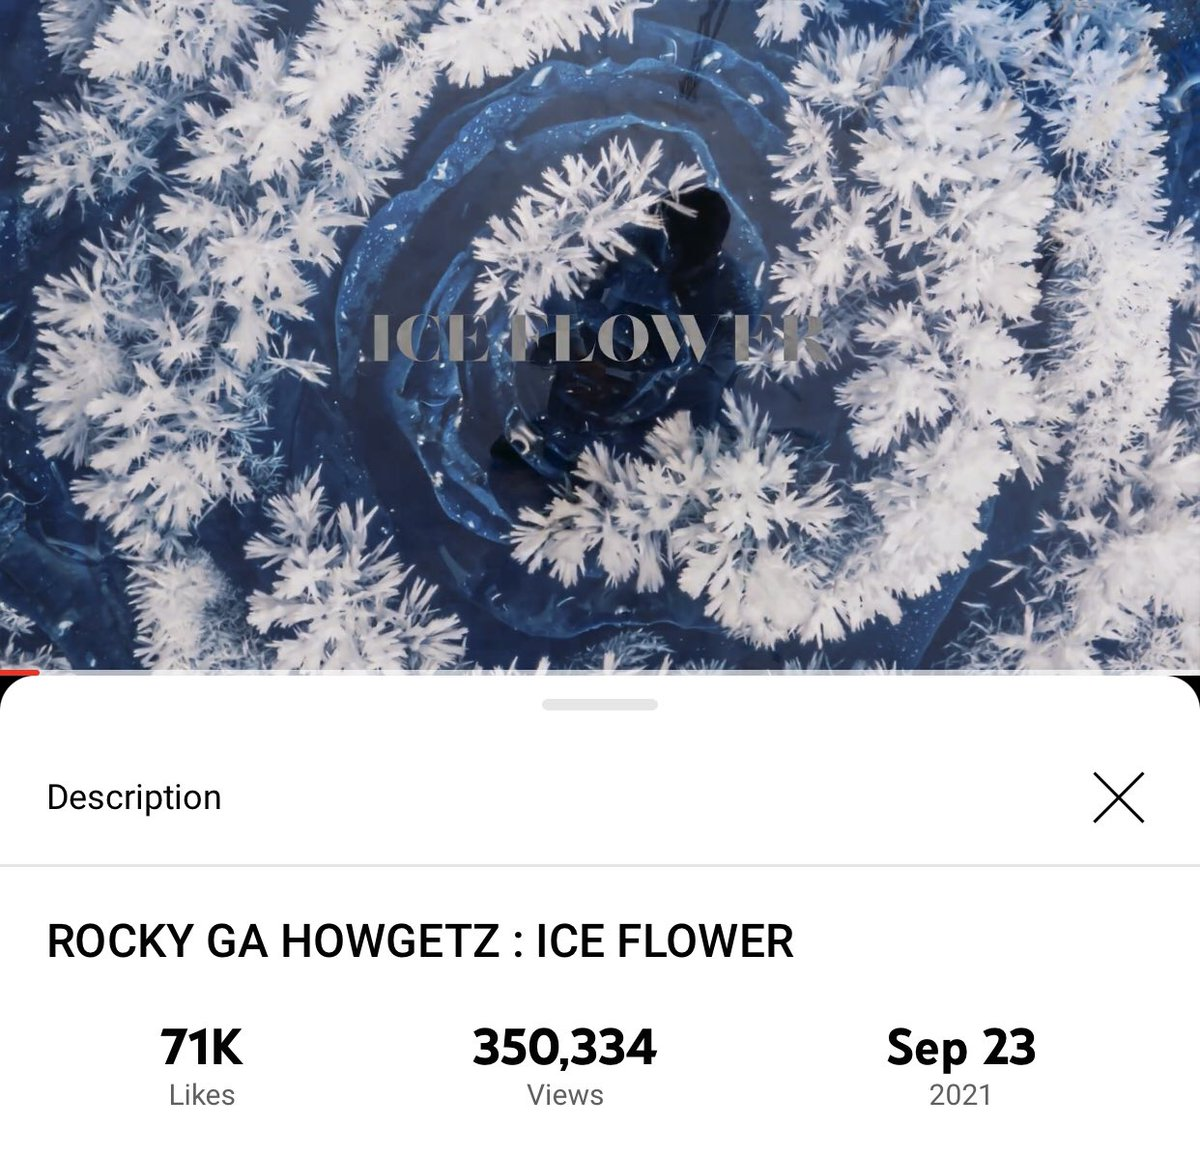 [📈] 210928 10:15 PM KST ROCKY GA HOWGETZ: ICE FLOWER Official Channel: 350,334 views (🔺276) 🔗youtu.be/5GAksgvR8nM #아스트로 #ASTRO #라키 #ROCKYGAHOWGETZ #ICE_FLOWER #라키가하겠지 @offclASTRO